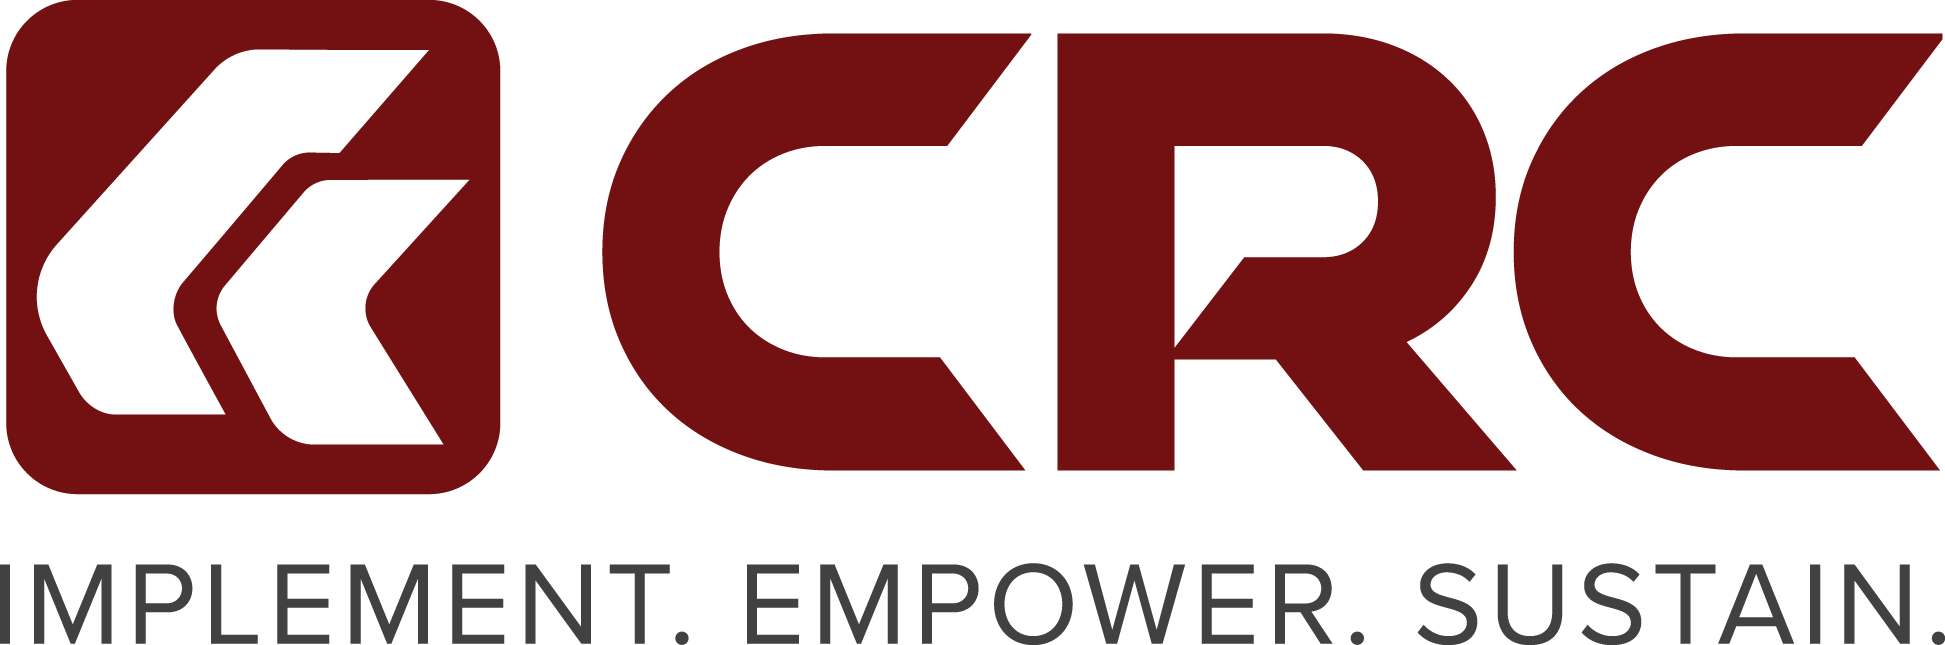 Crisis Response Group